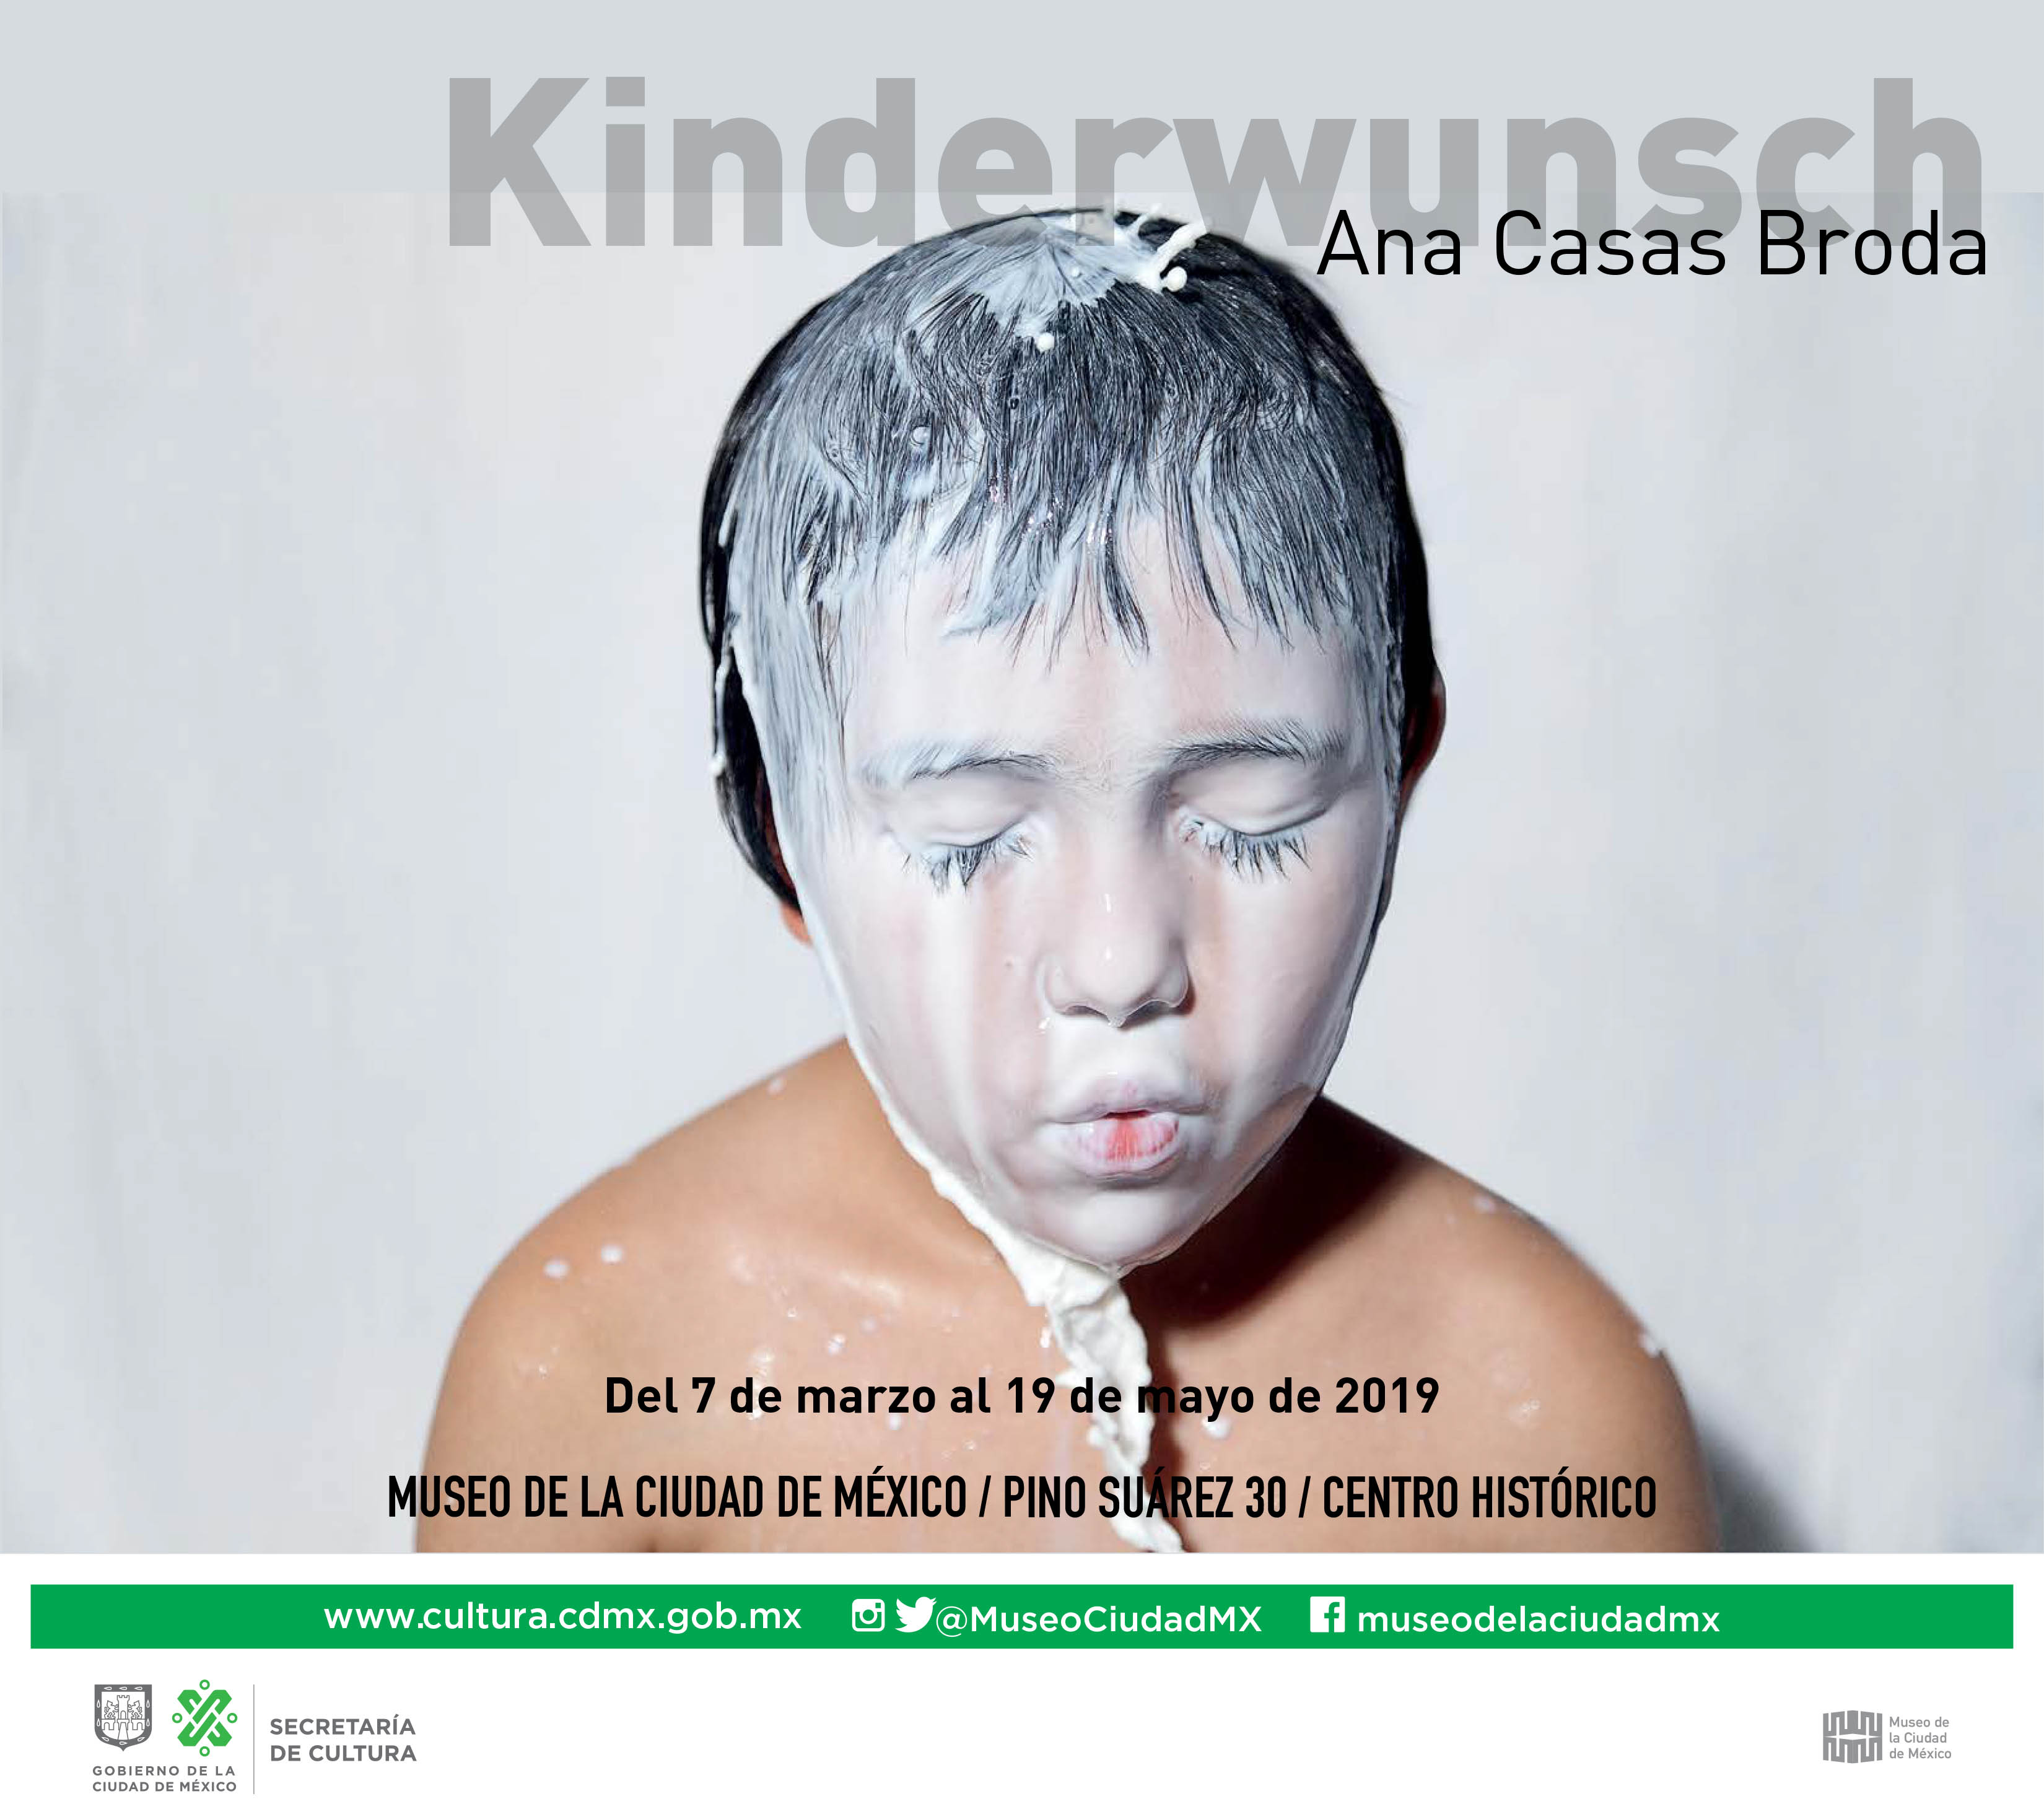 Kinderwunsch. Ana Casas Broda